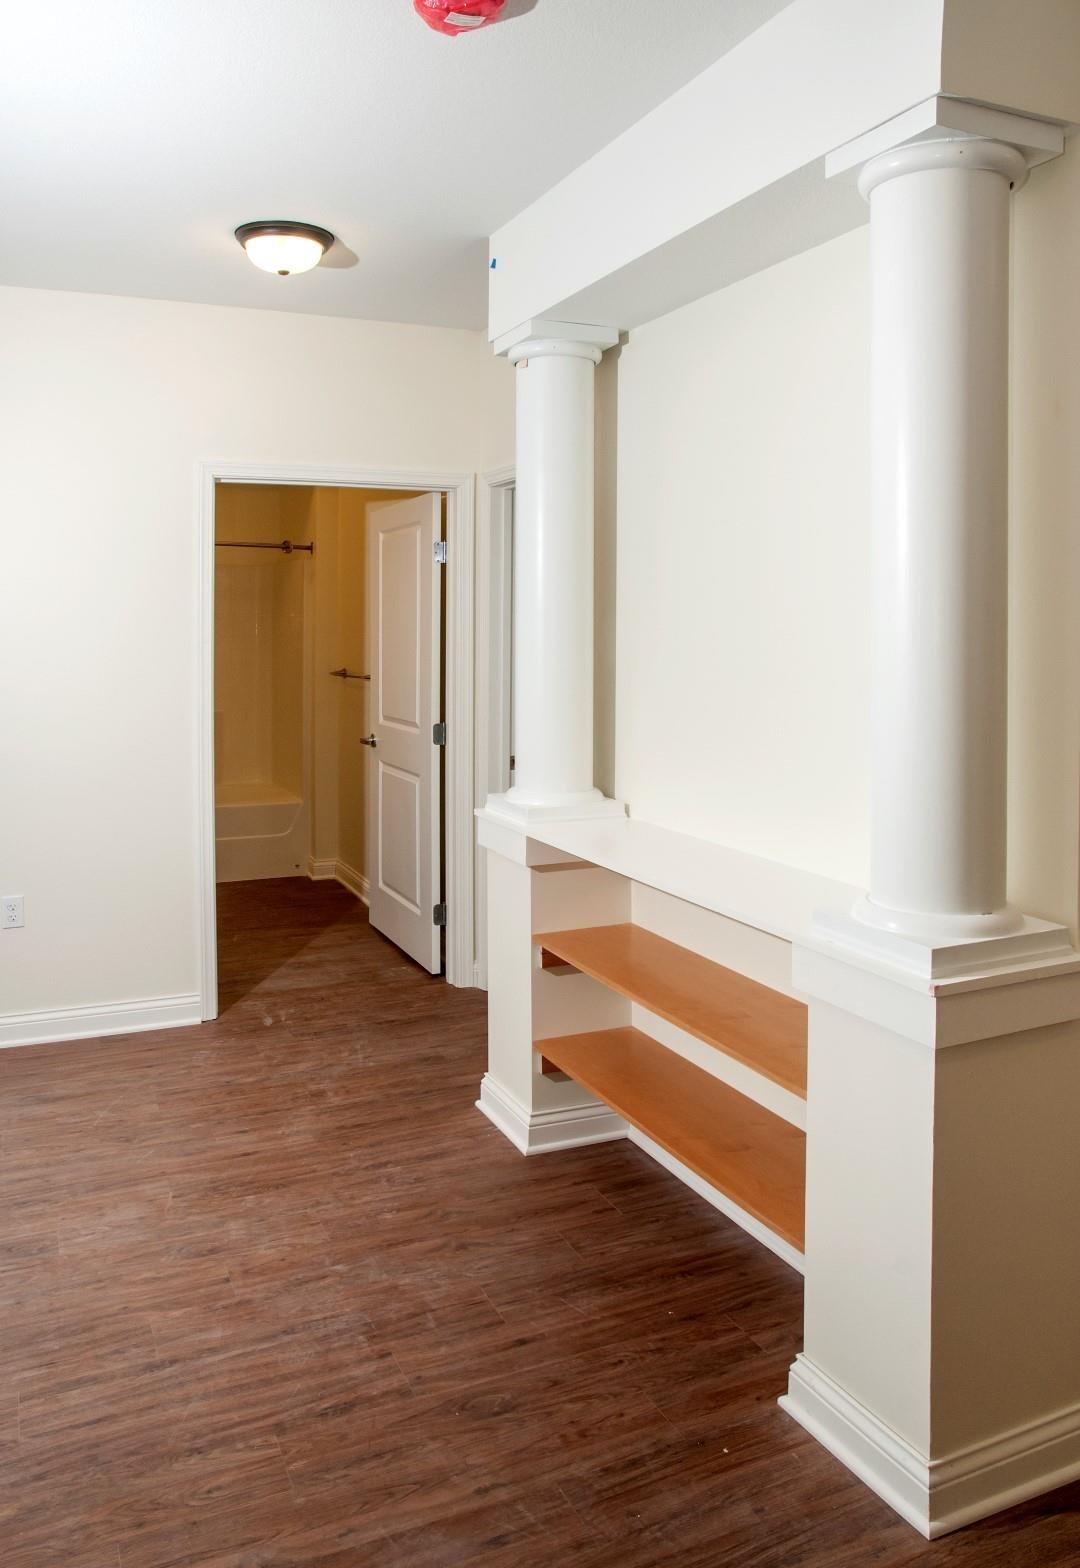 Spacious Layouts at 5 Central Apartments, Minnesota, 55369